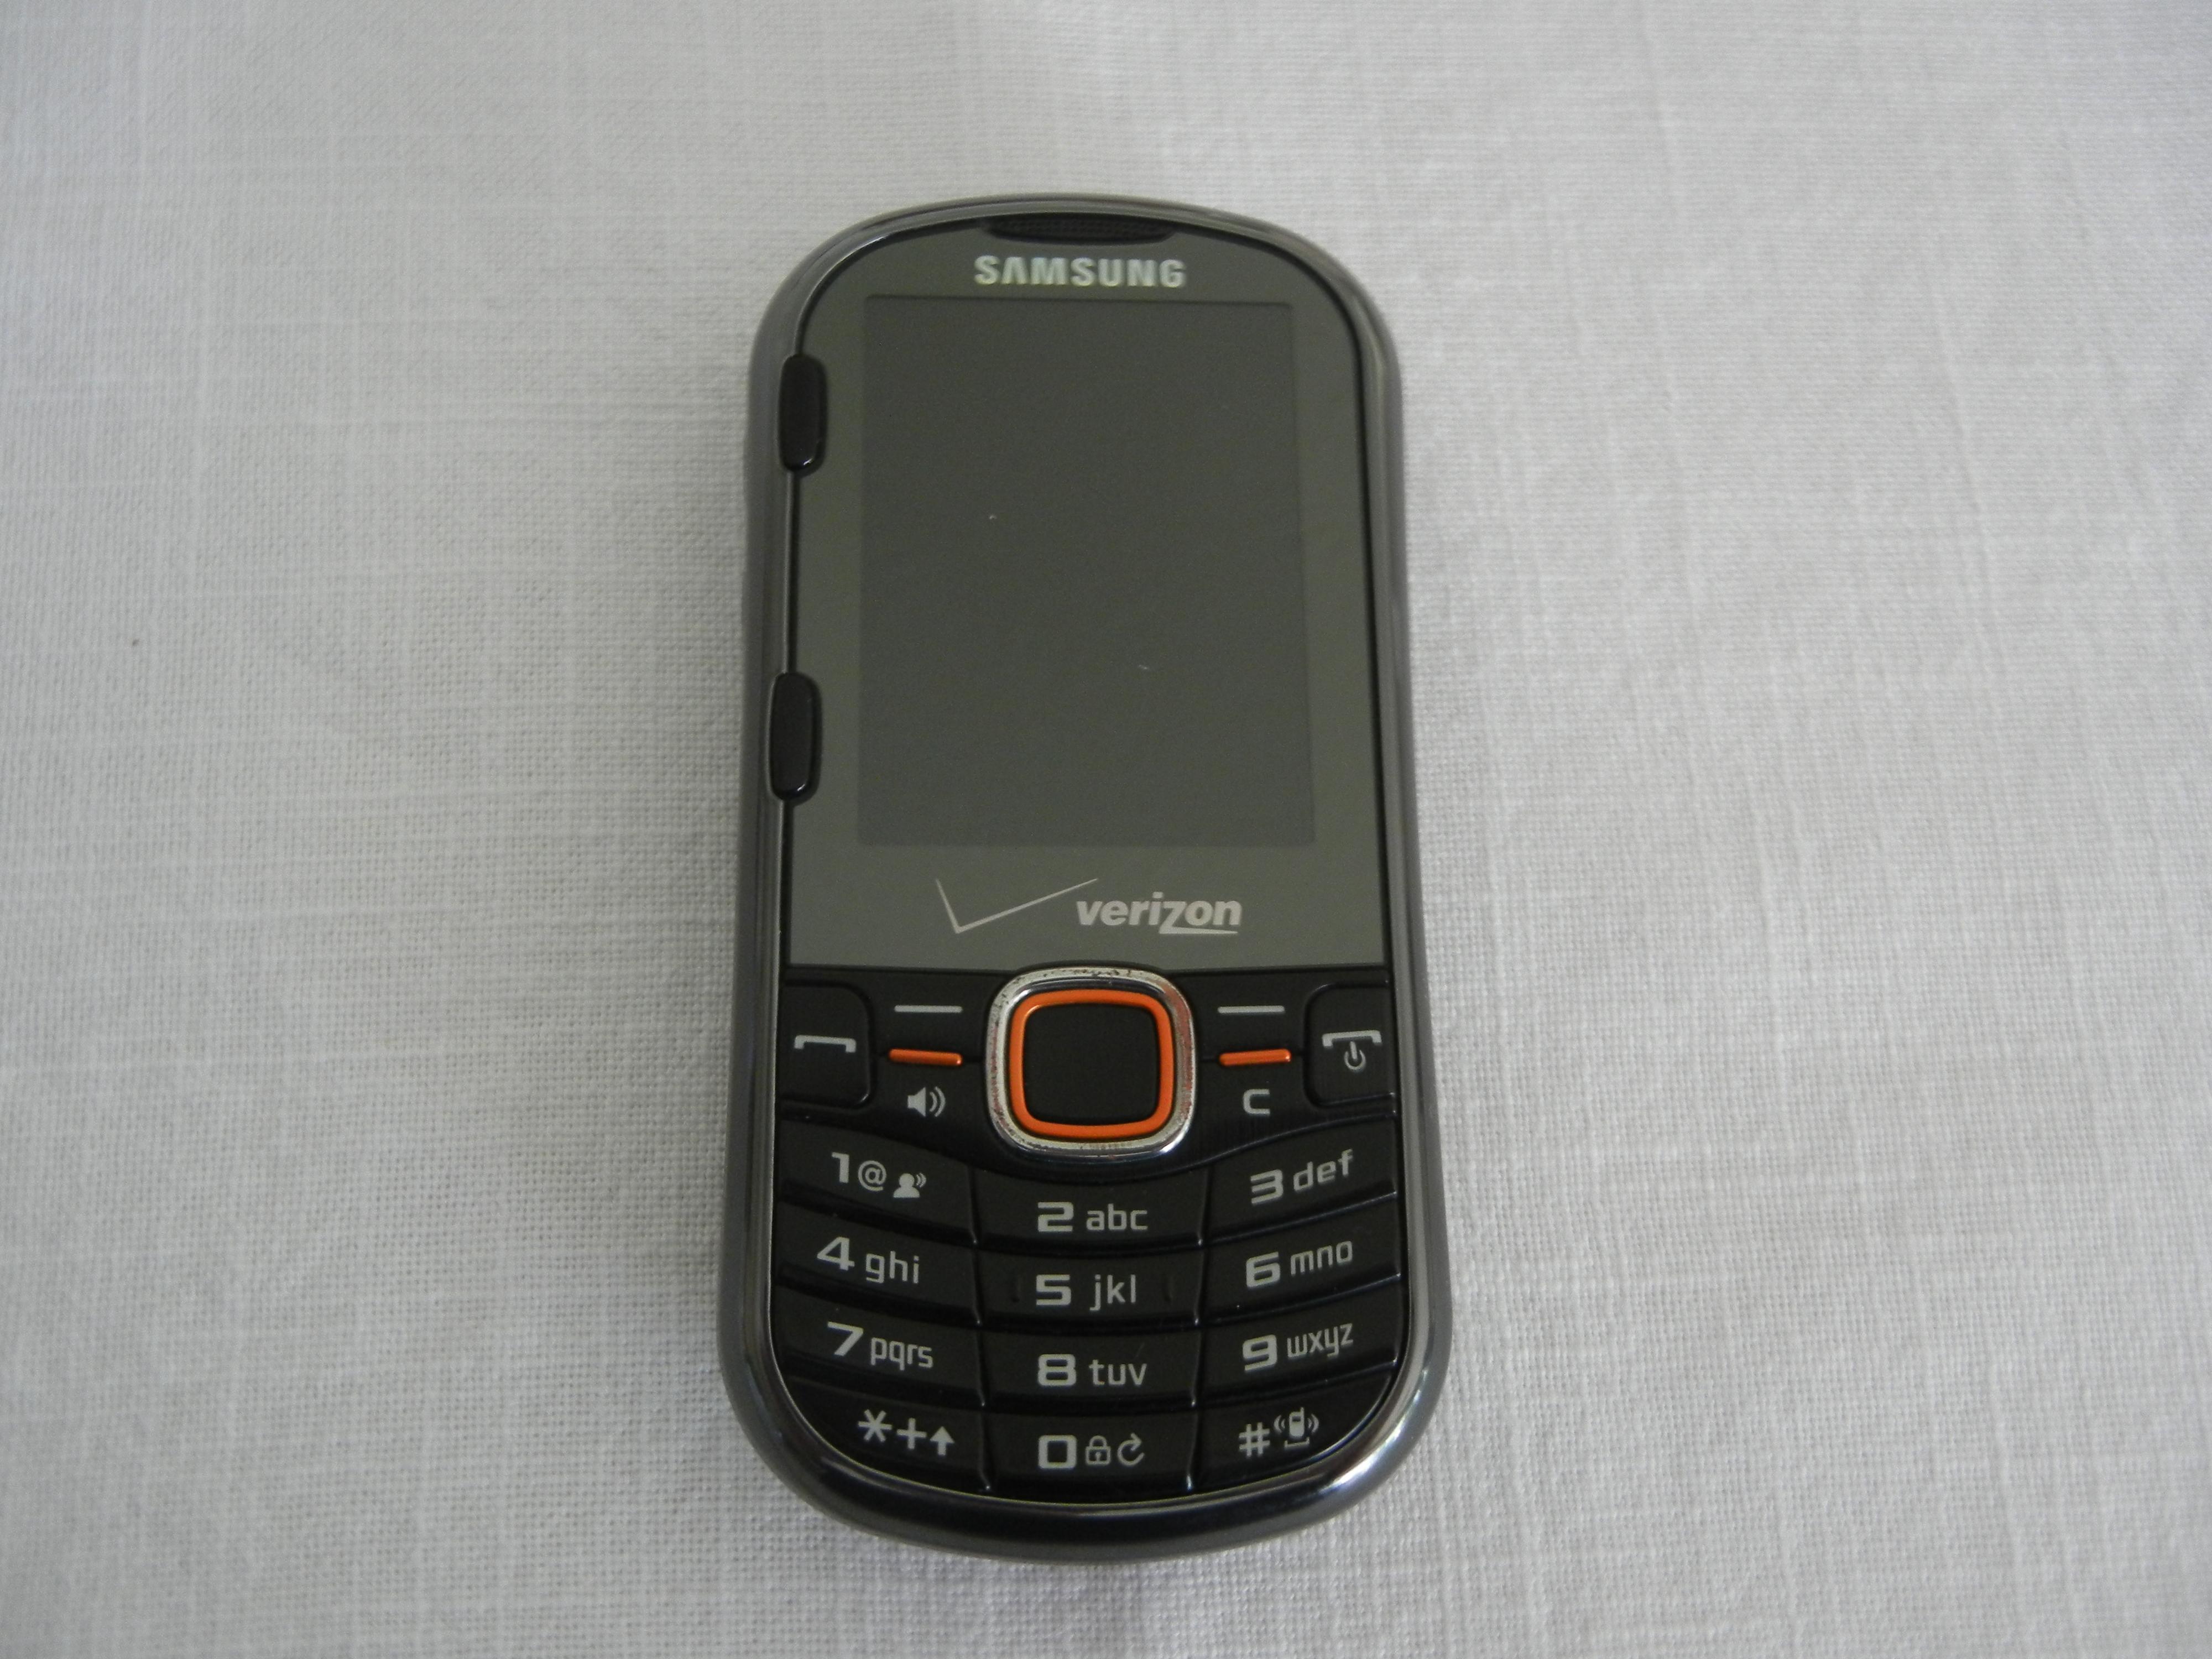 samsung intensity ii wikiwand rh wikiwand com Cell Phone Samsung Intensity II Manual user manual for samsung intensity ii cell phone